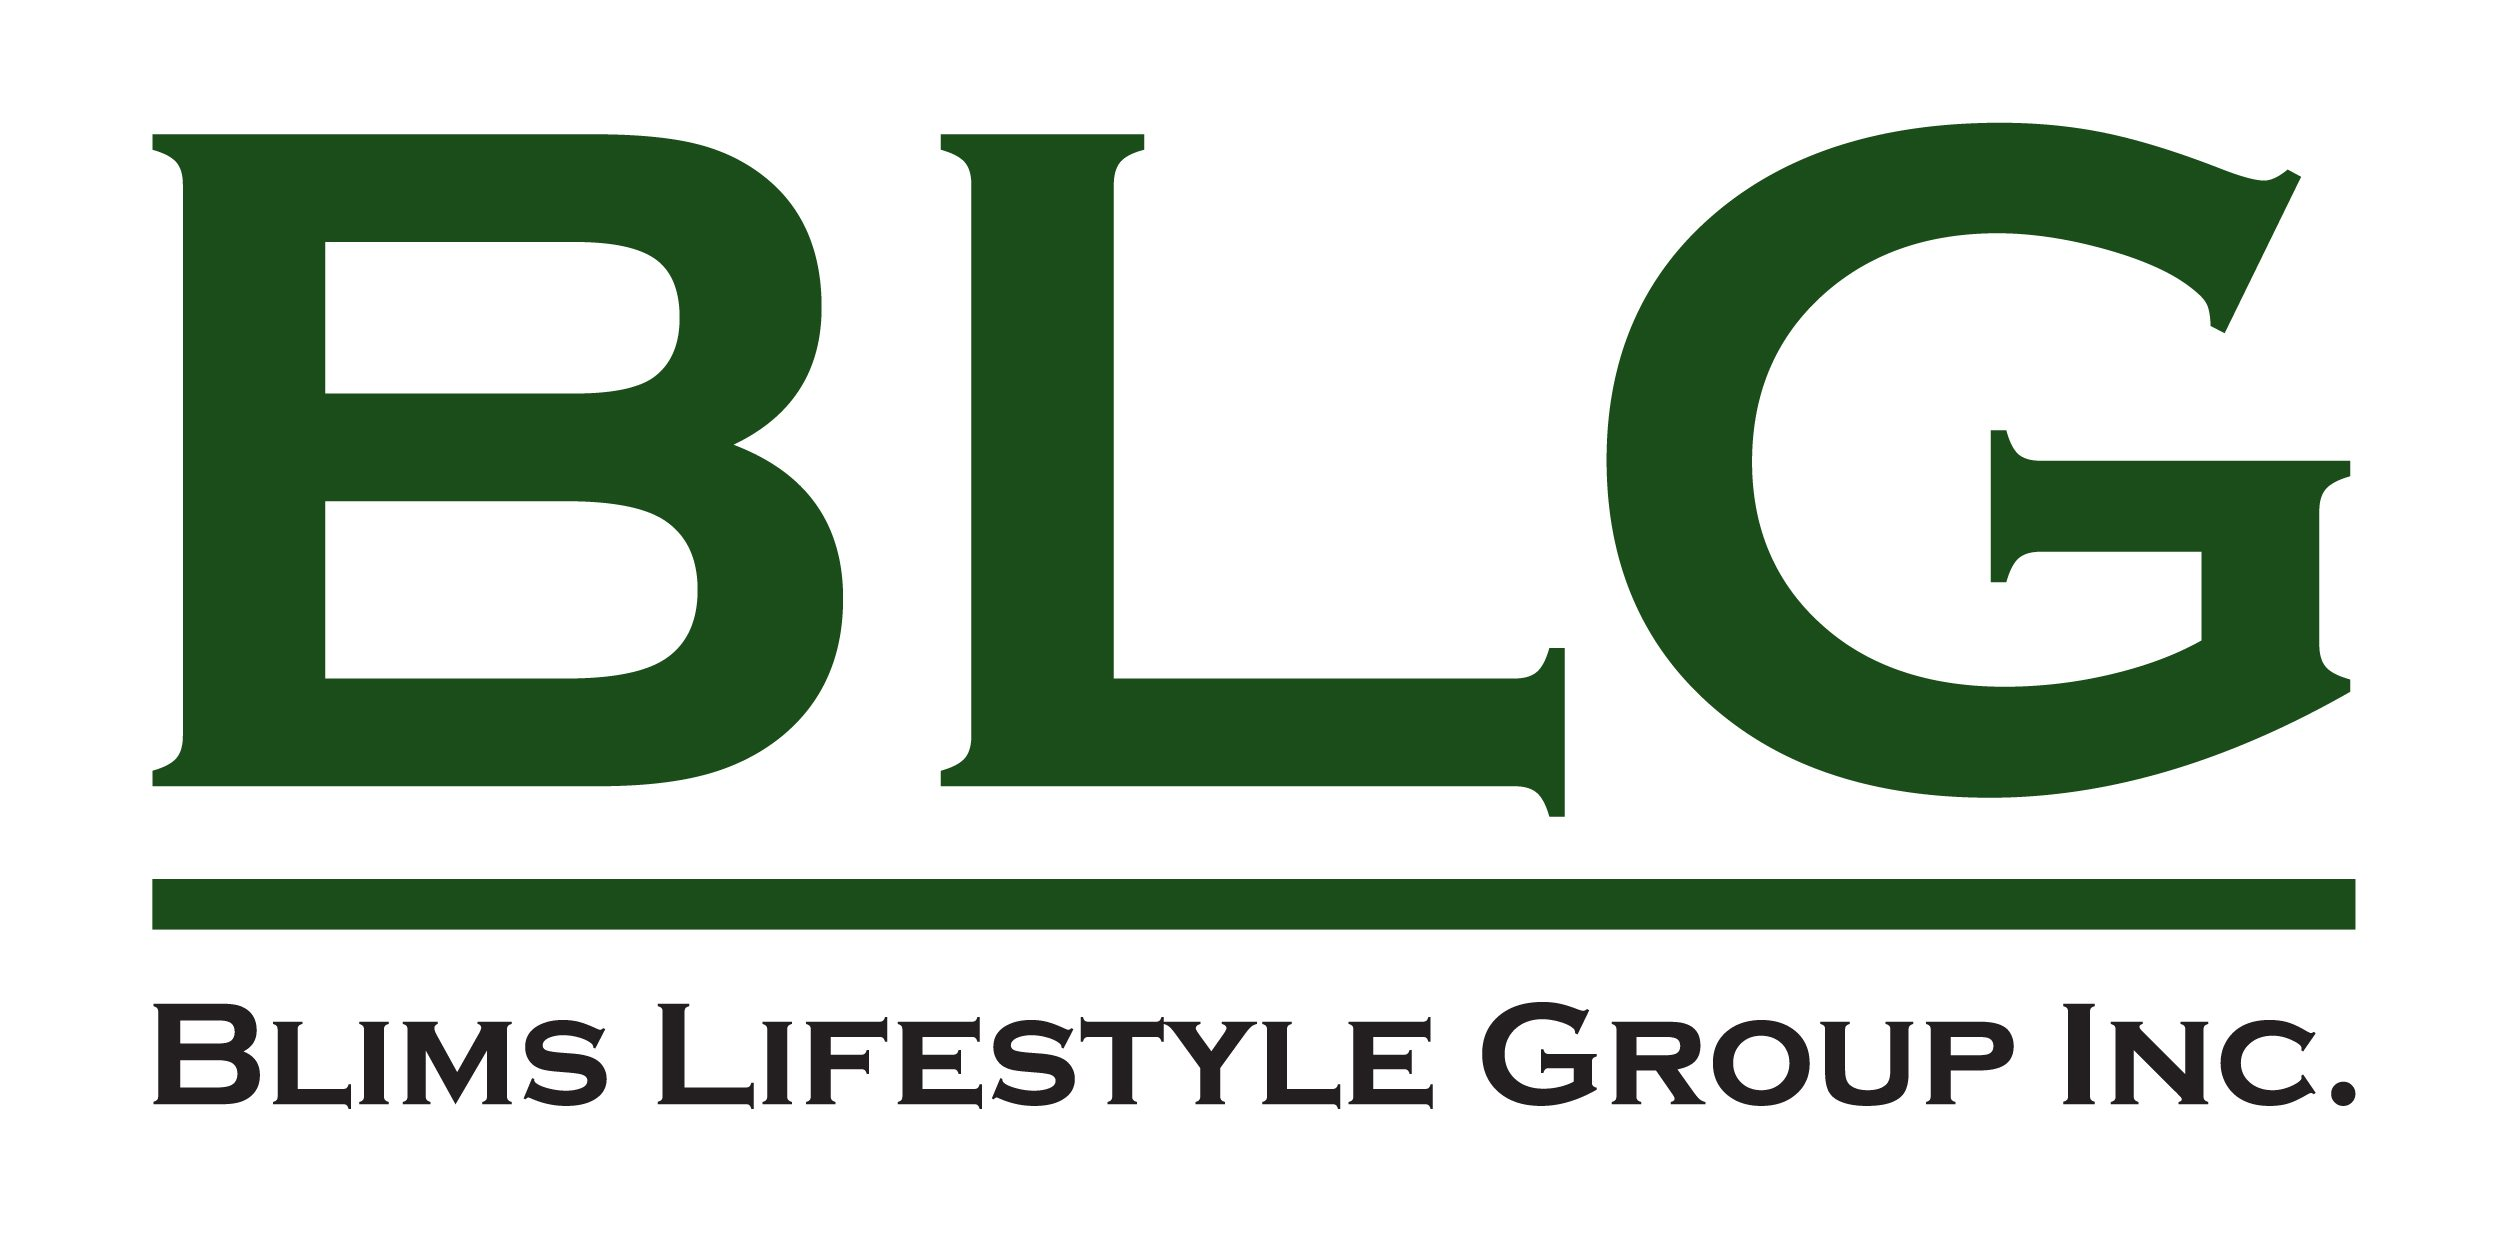 Blims Lifestyle Group, Inc.